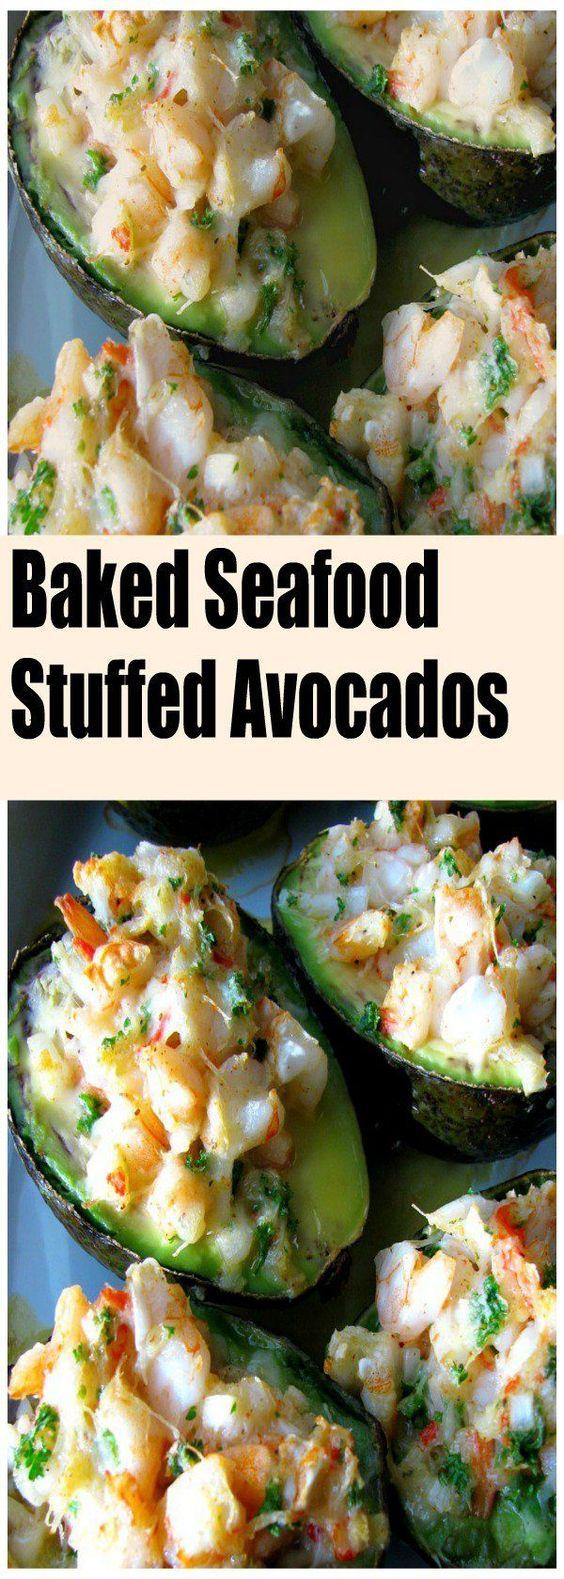 Baked Seafood Stuffed Avocados